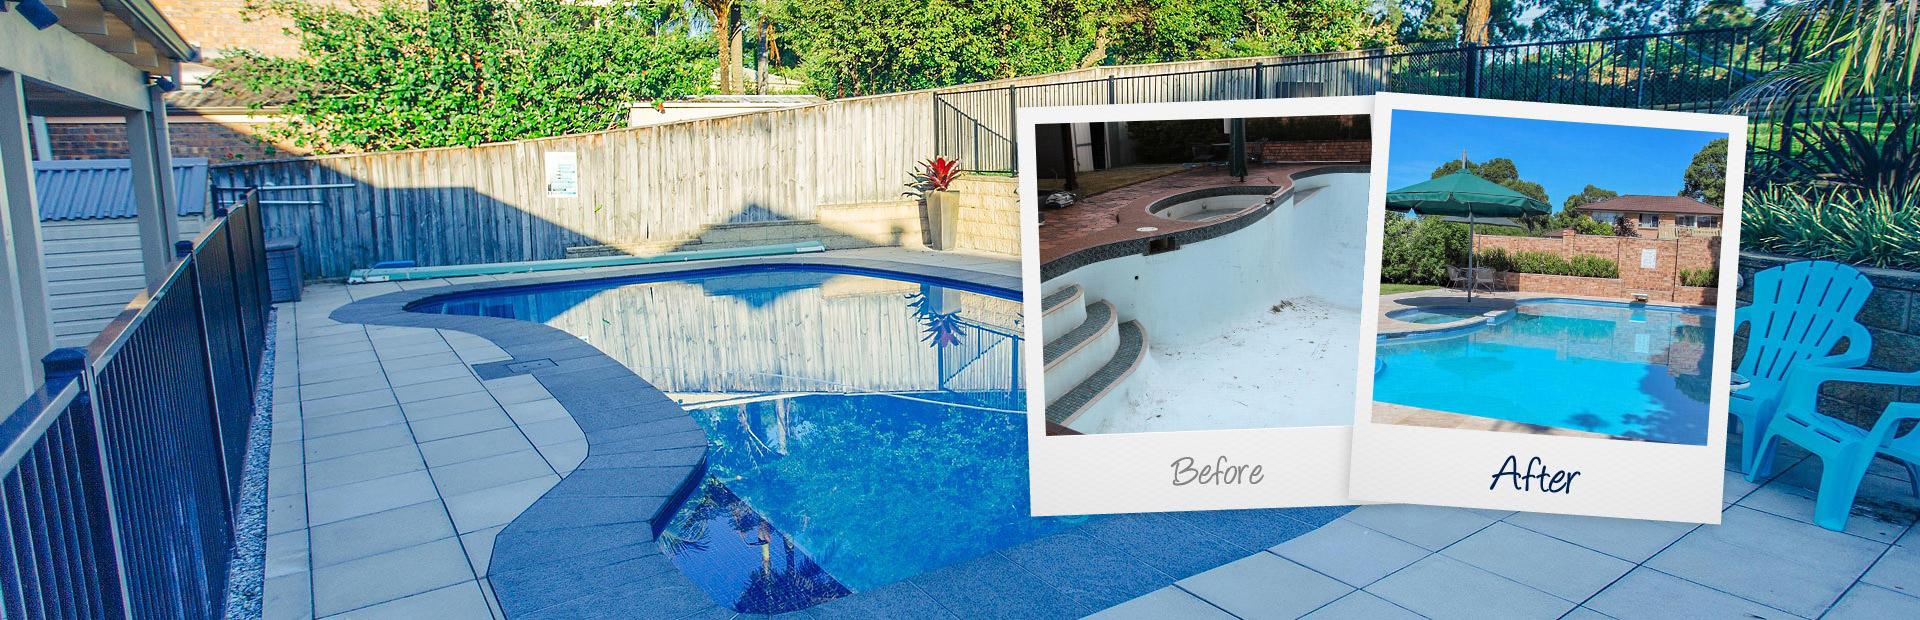 Hills pool painting renovation for Swimming pool resurfacing sydney